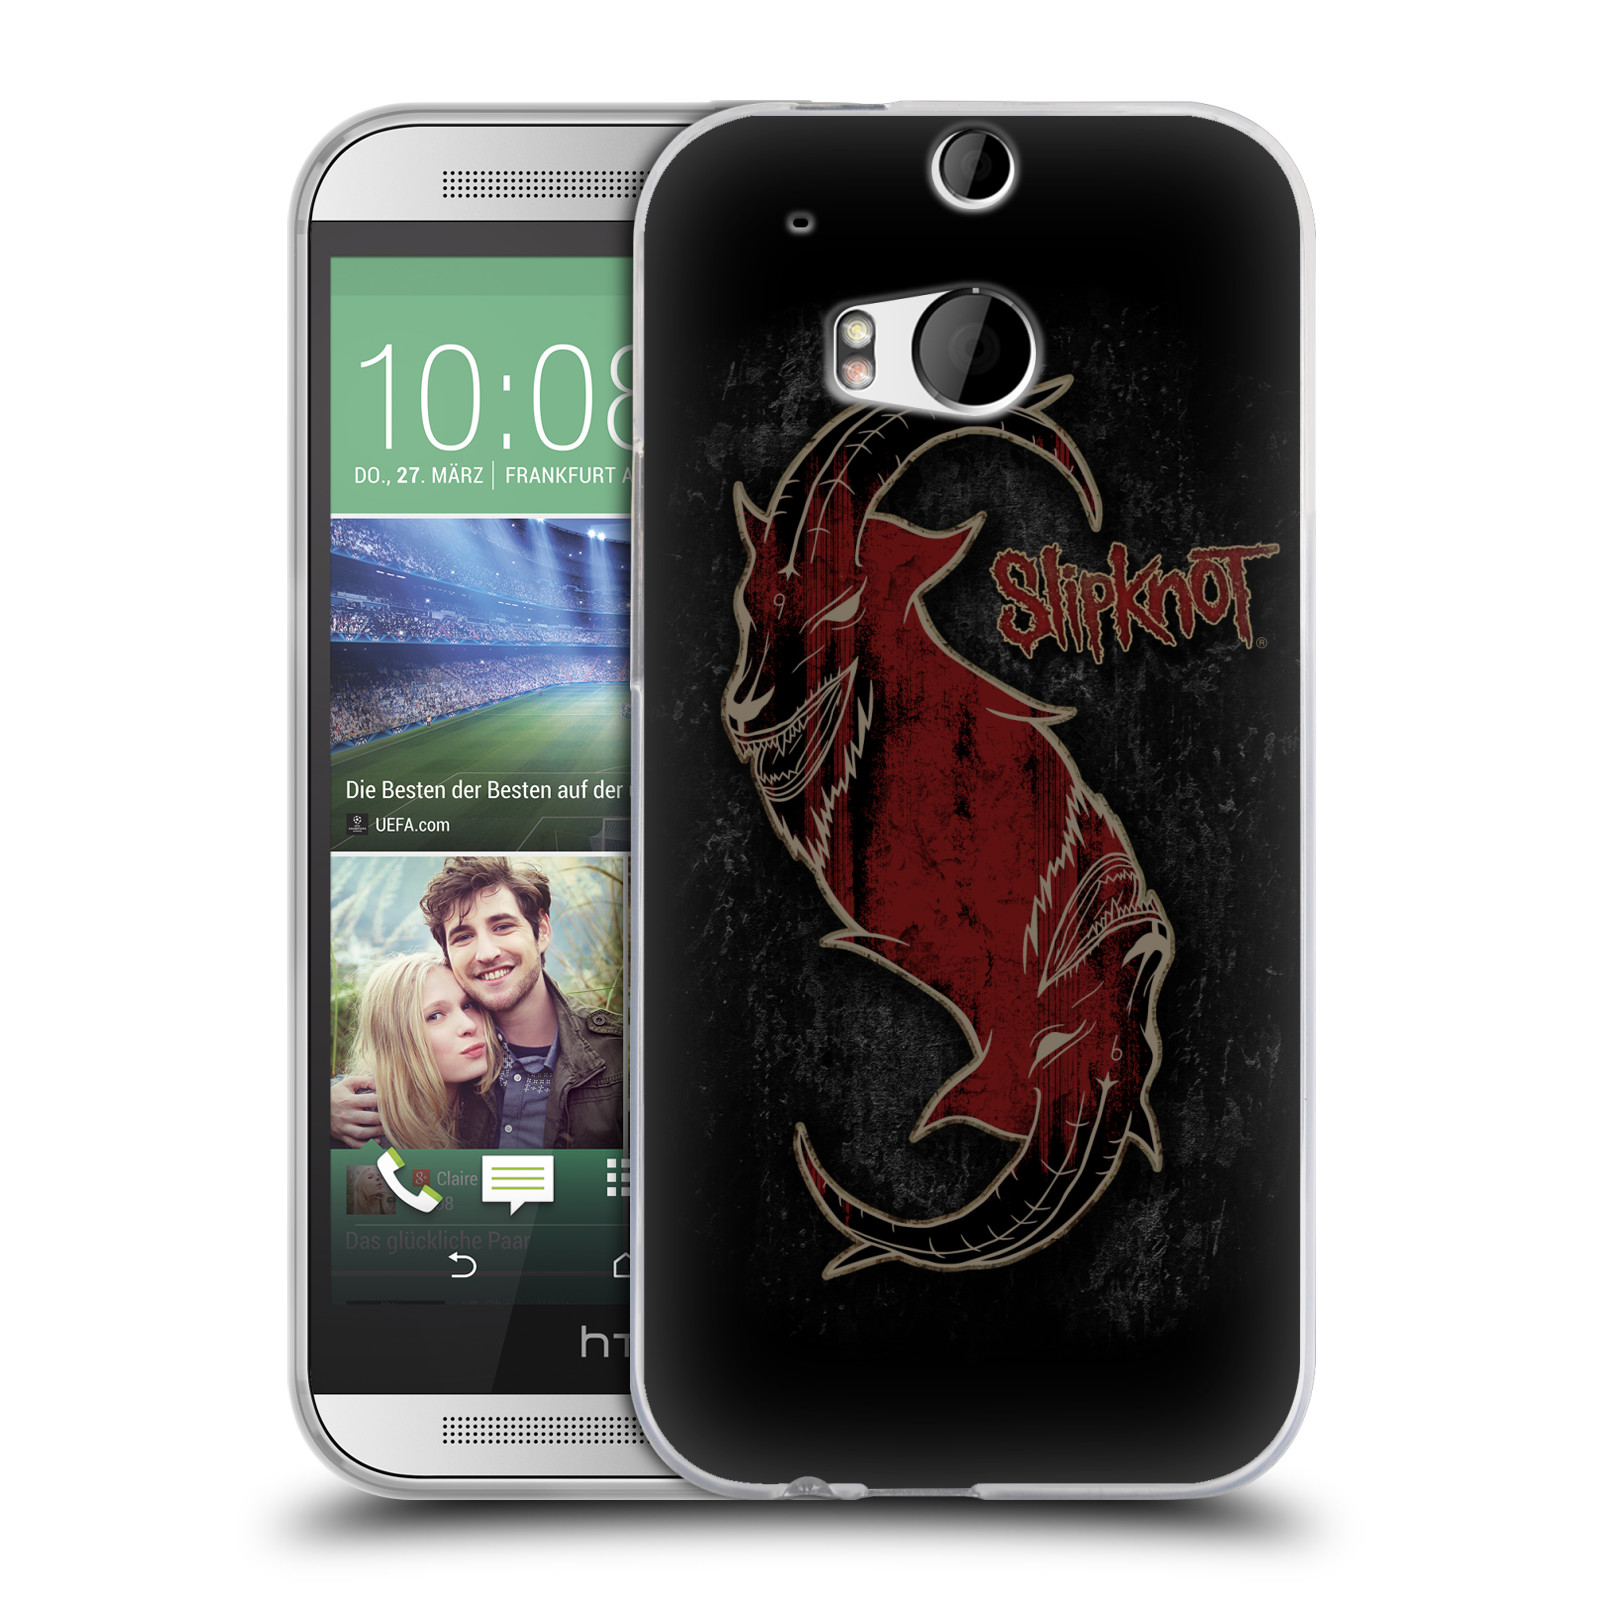 Silikonové pouzdro na mobil HTC ONE M8 HEAD CASE Slipknot - Rudý kozel